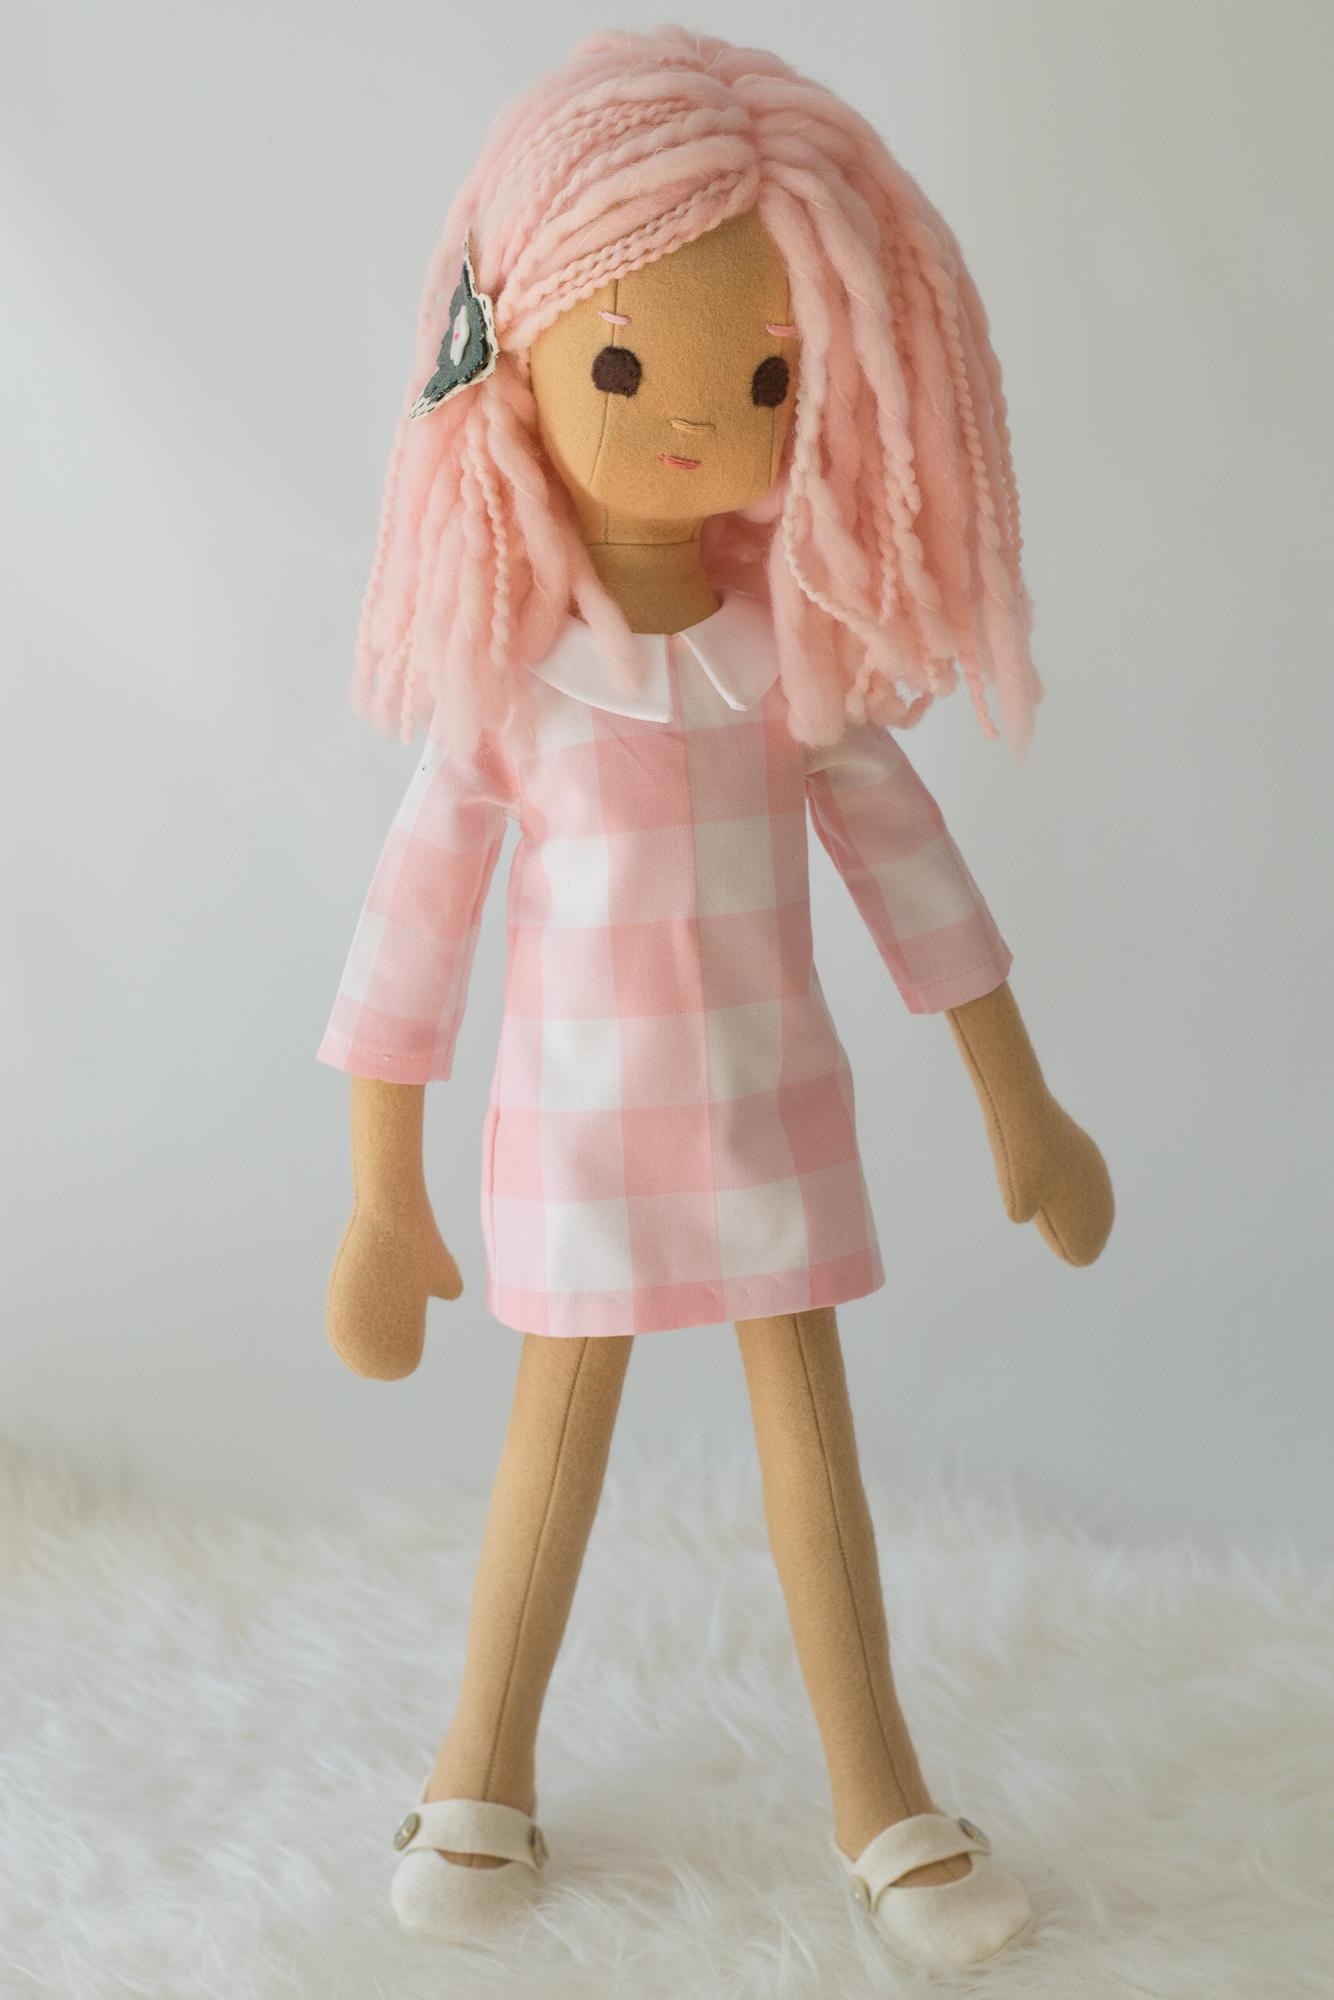 Gallery of Dolls-11.jpg